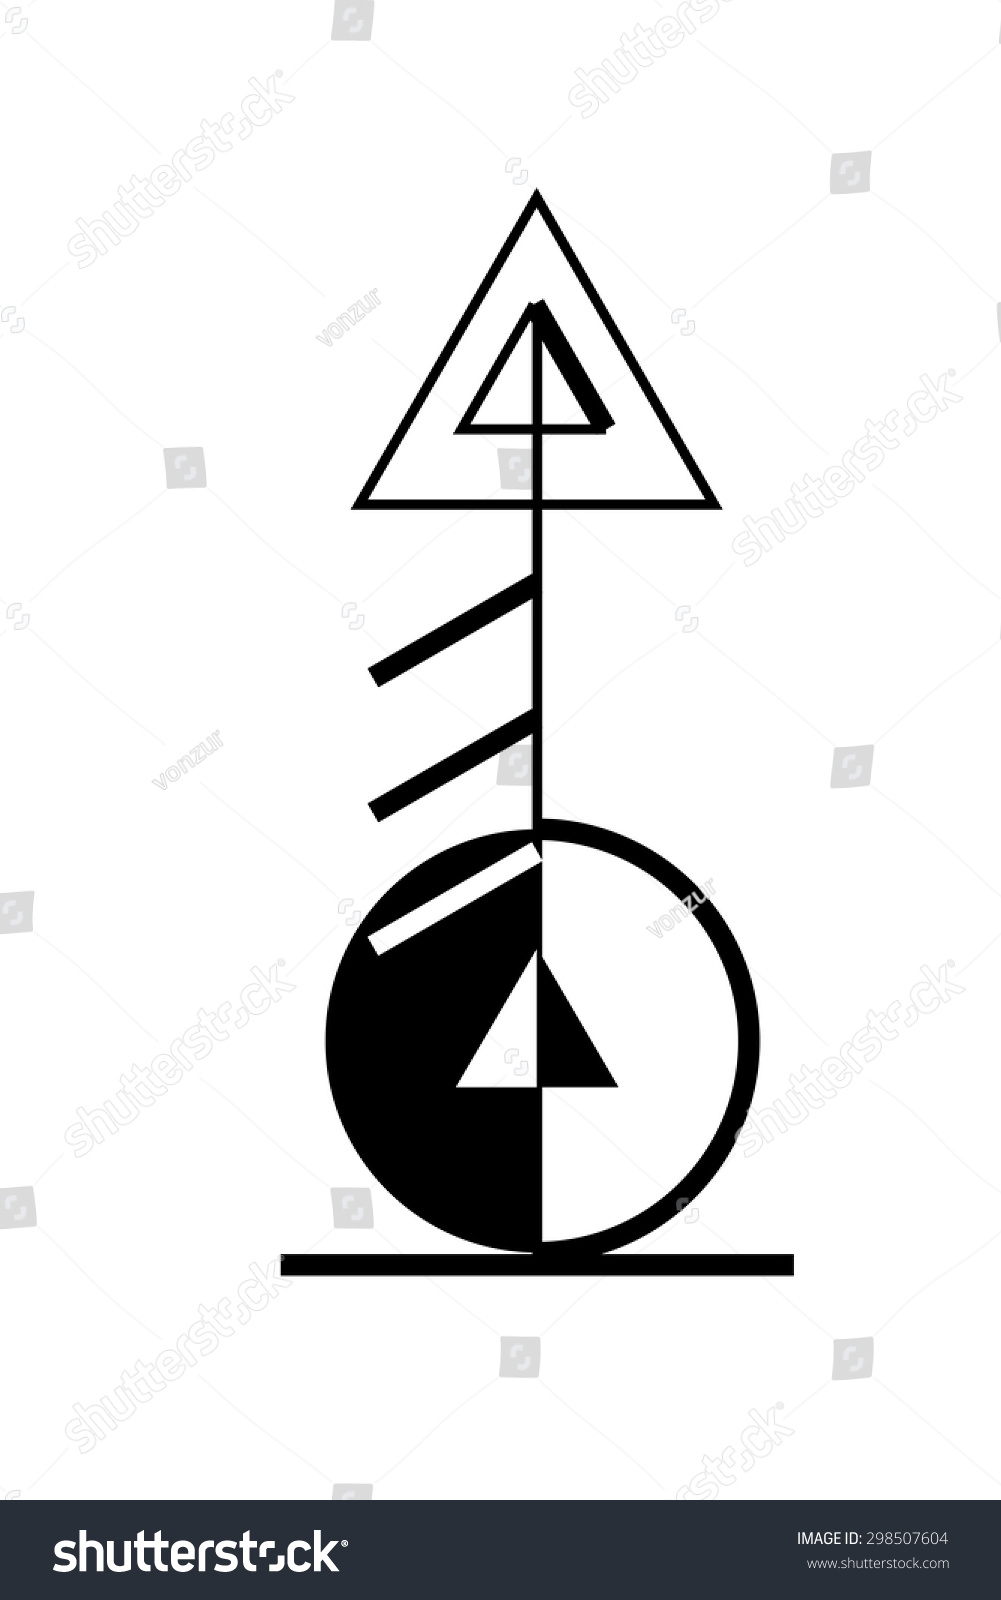 Sacred geometry magic runic symbol tattoo stock vector 298507604 sacred geometry magic runic symbol tattoo art stock vector buycottarizona Choice Image